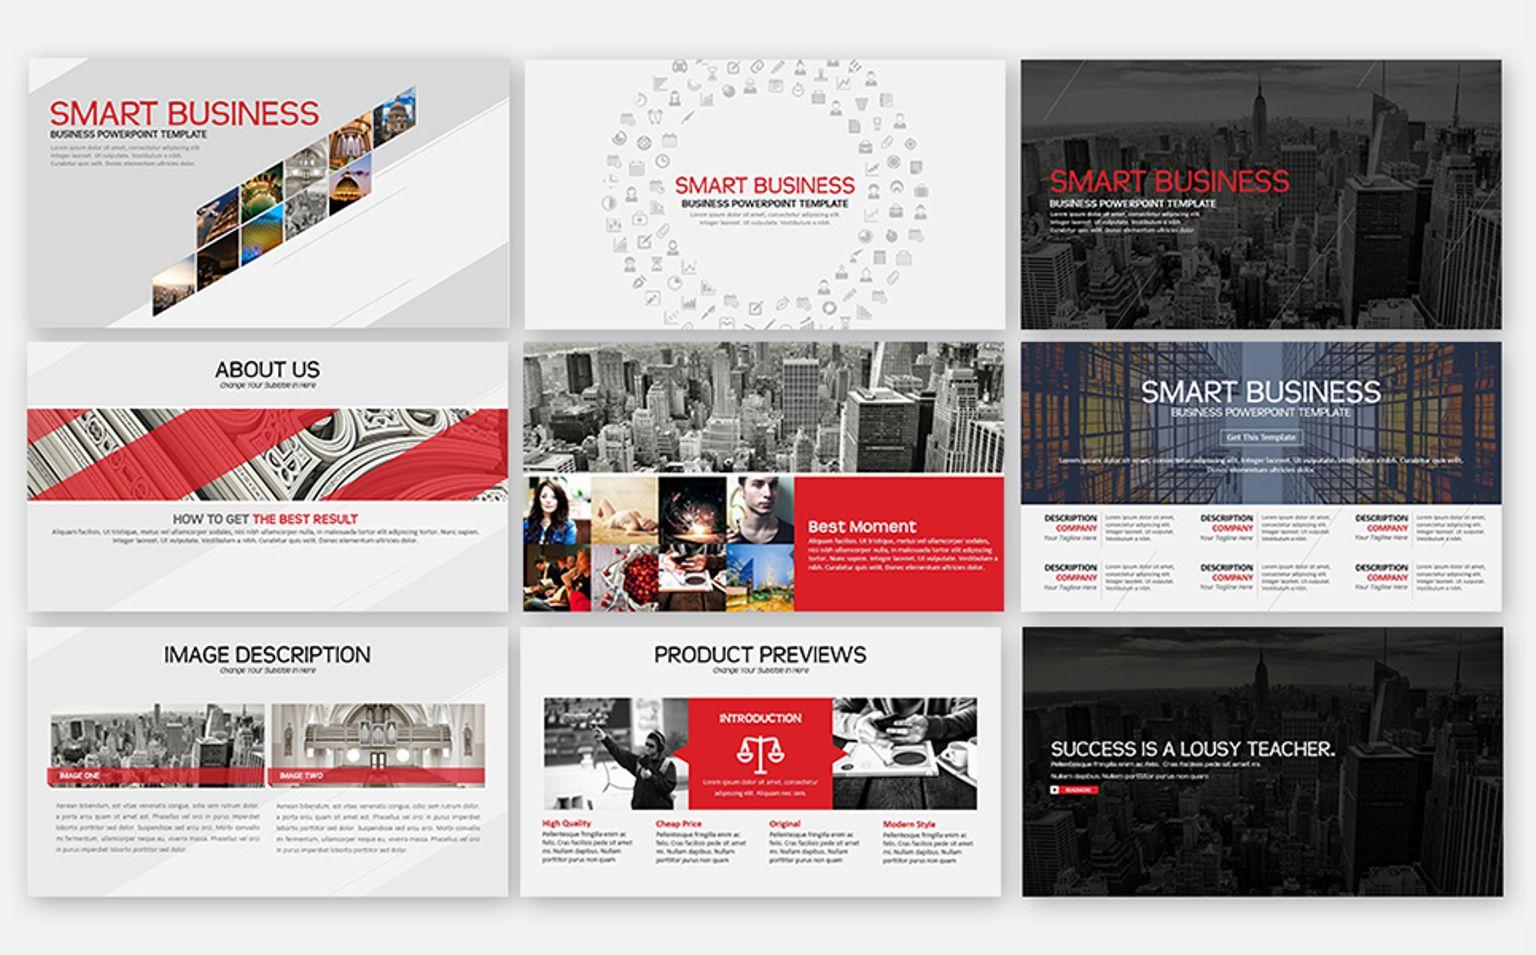 Smart Business Powerpoint Template #65685